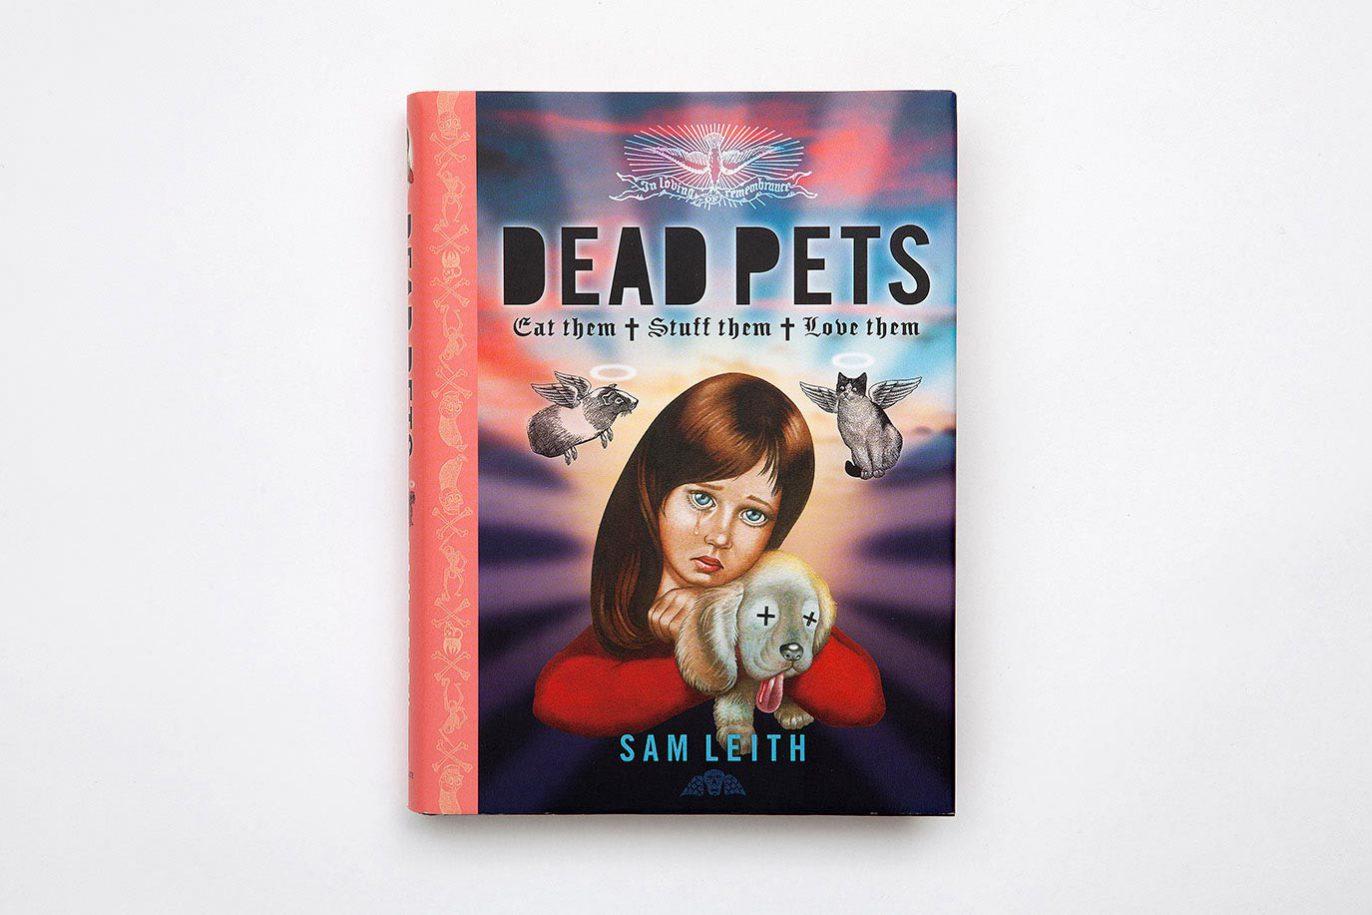 Dead Pets